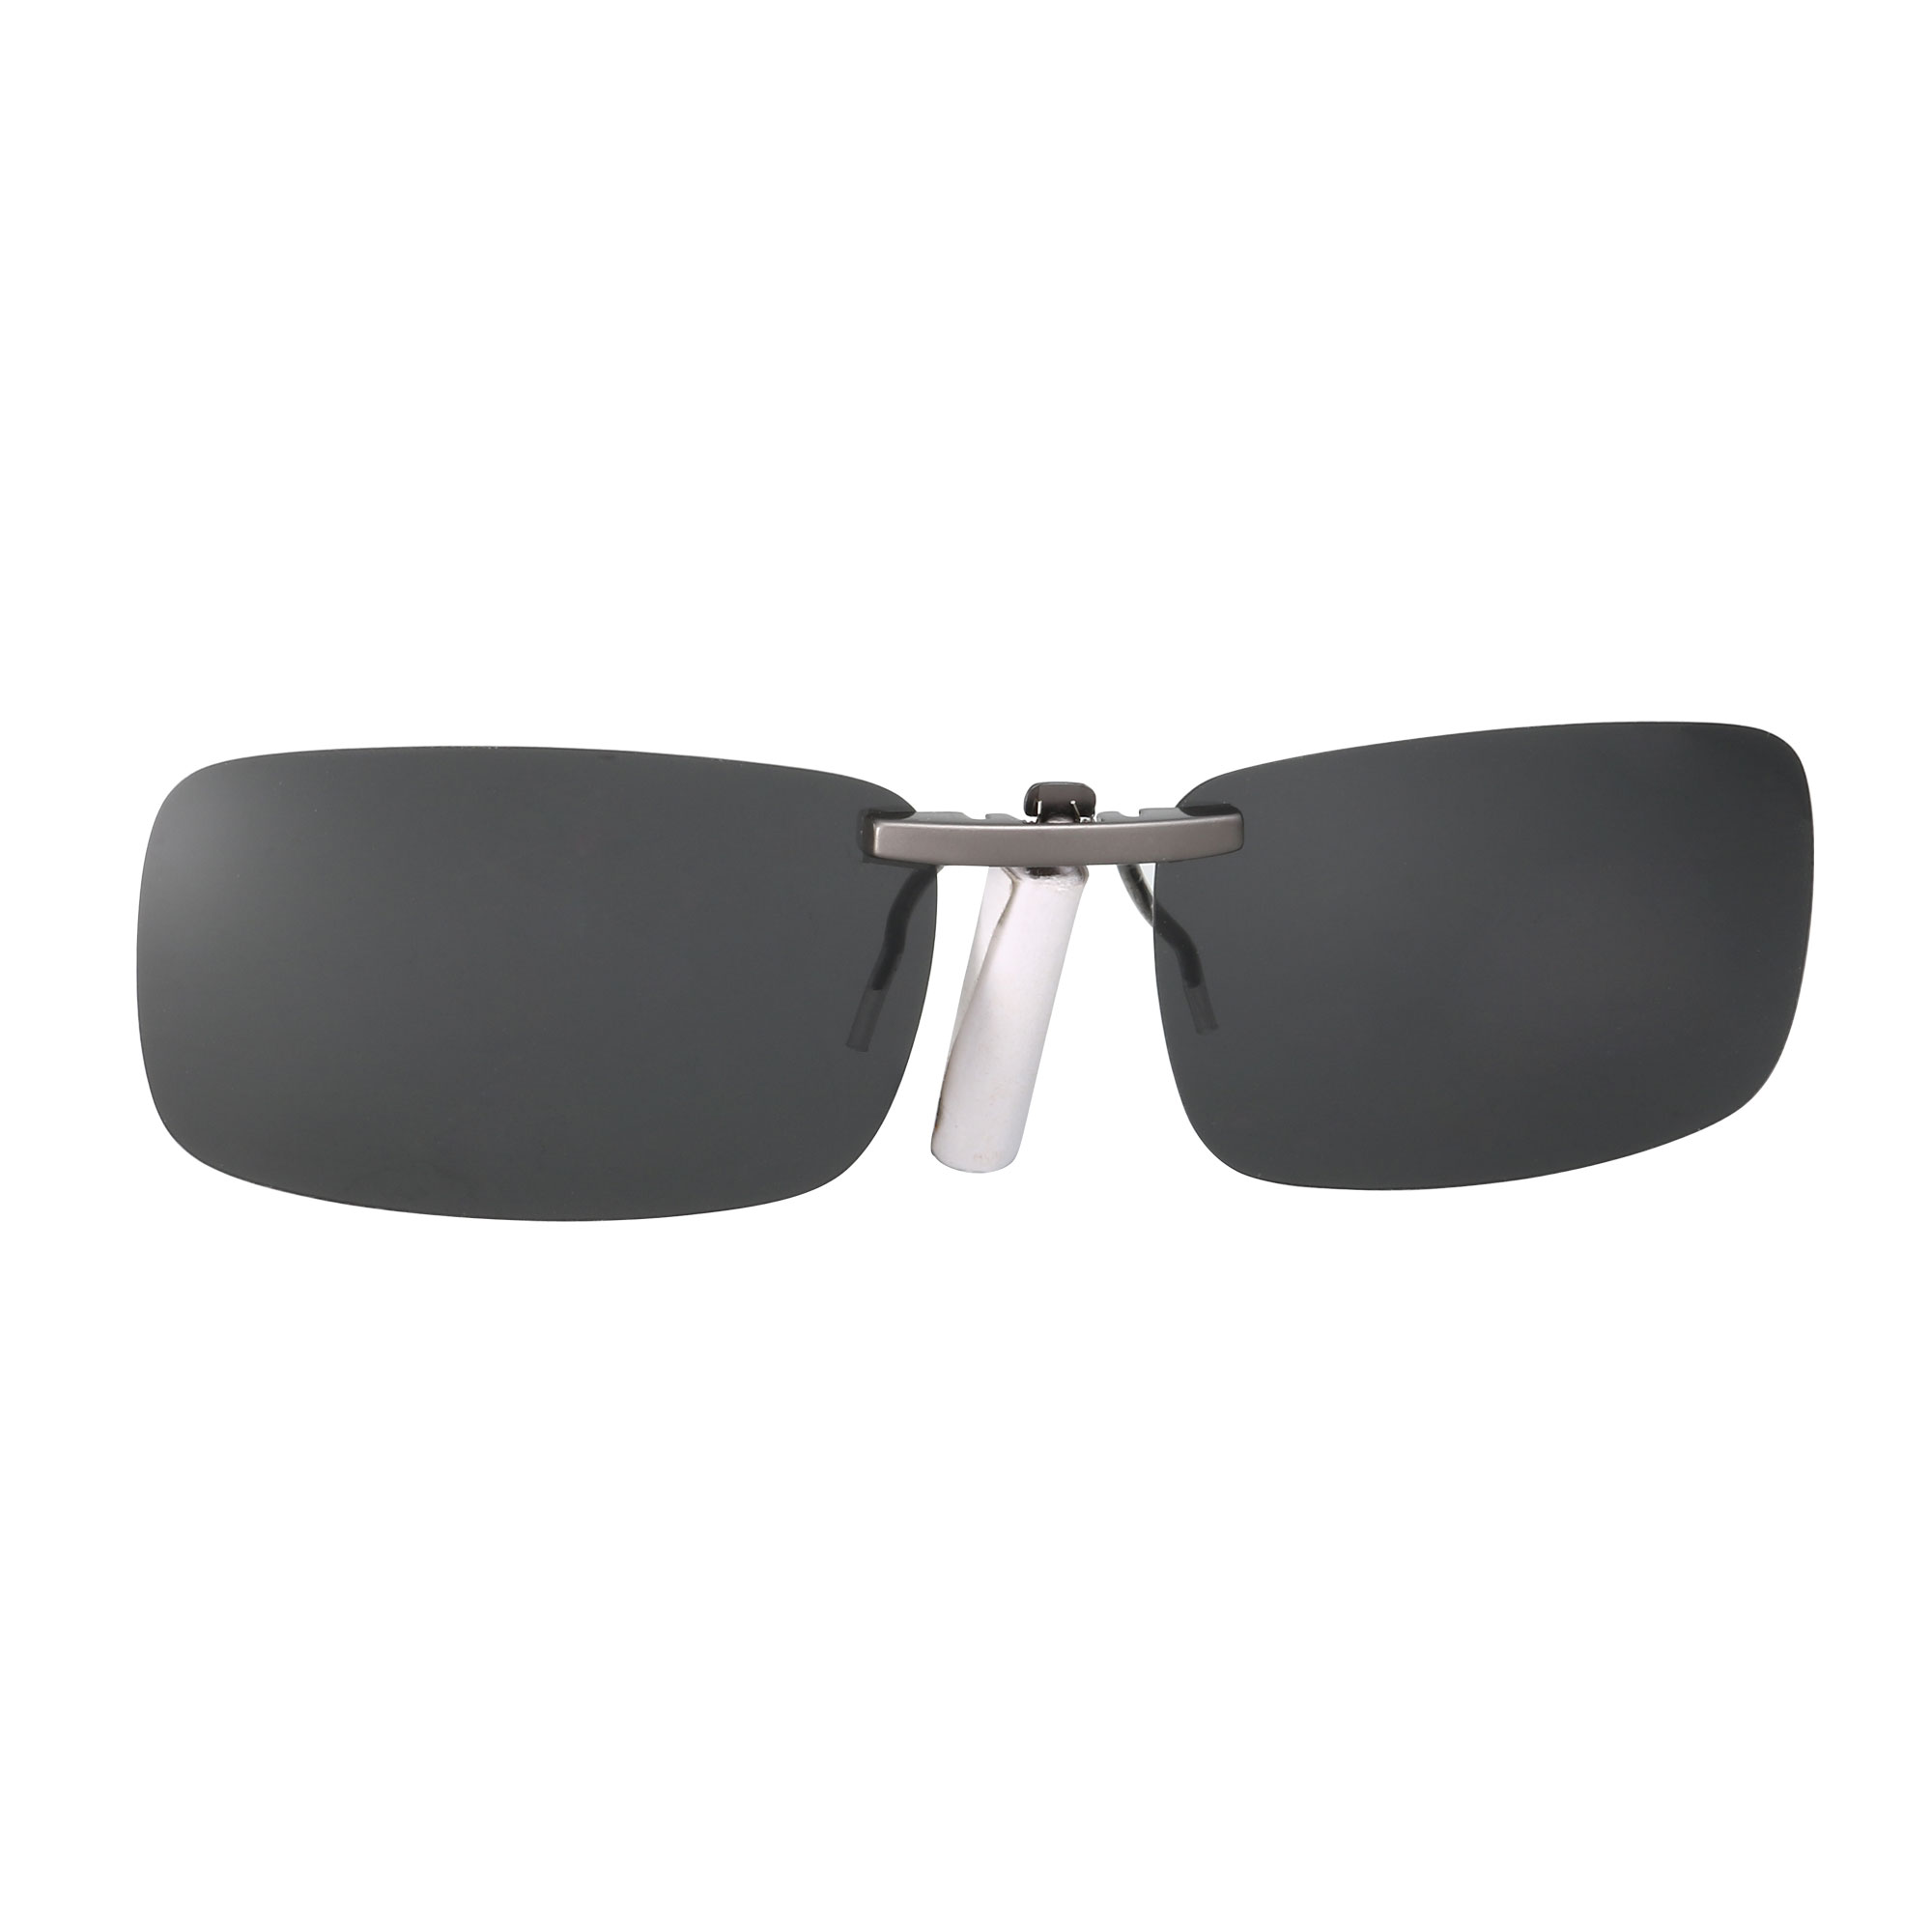 Unisex Clear Black Polarized Lens Sunglasses Clip On Eyeglasses